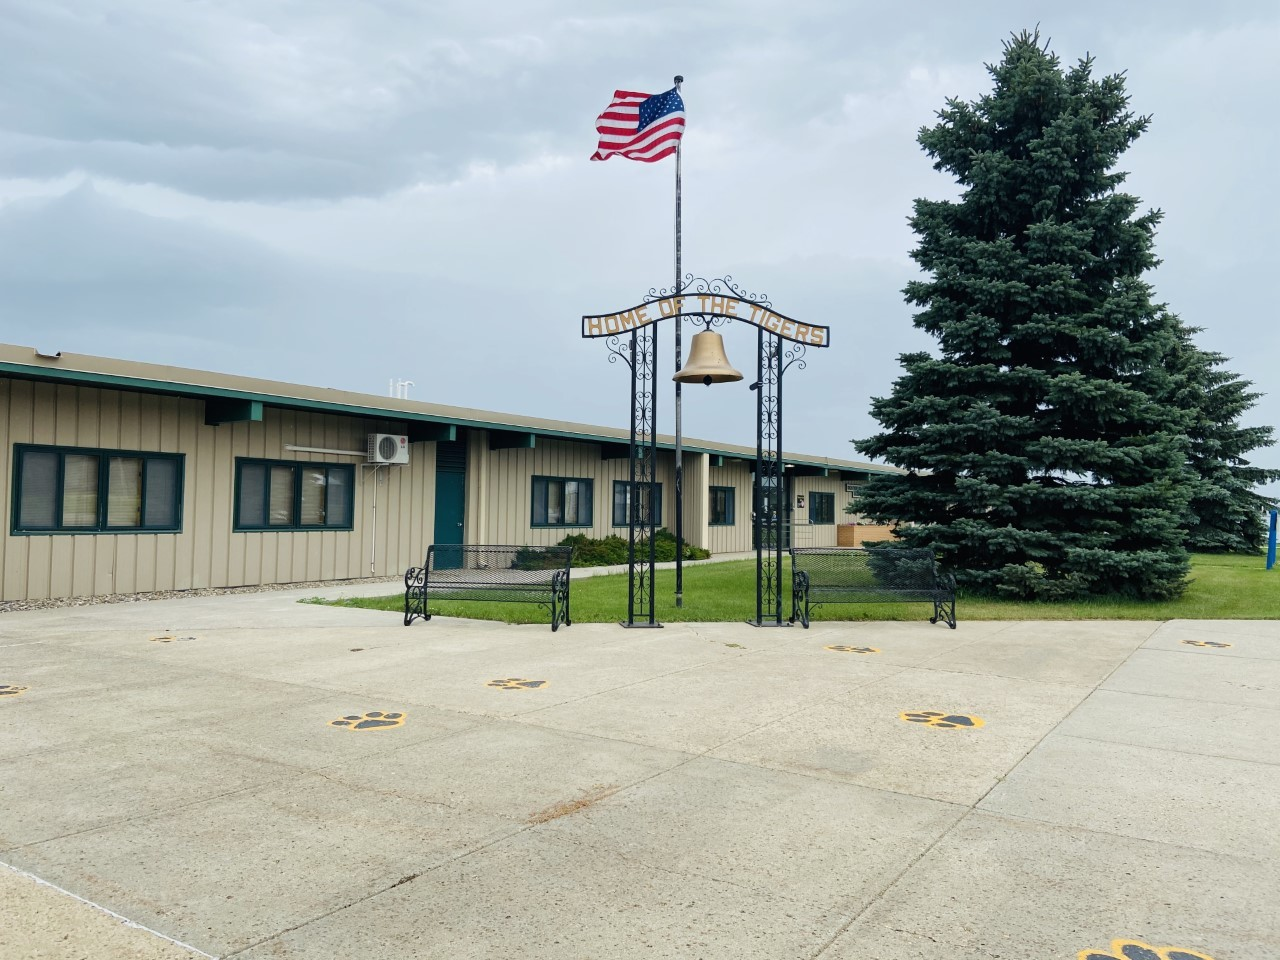 Welcome to HMB School!